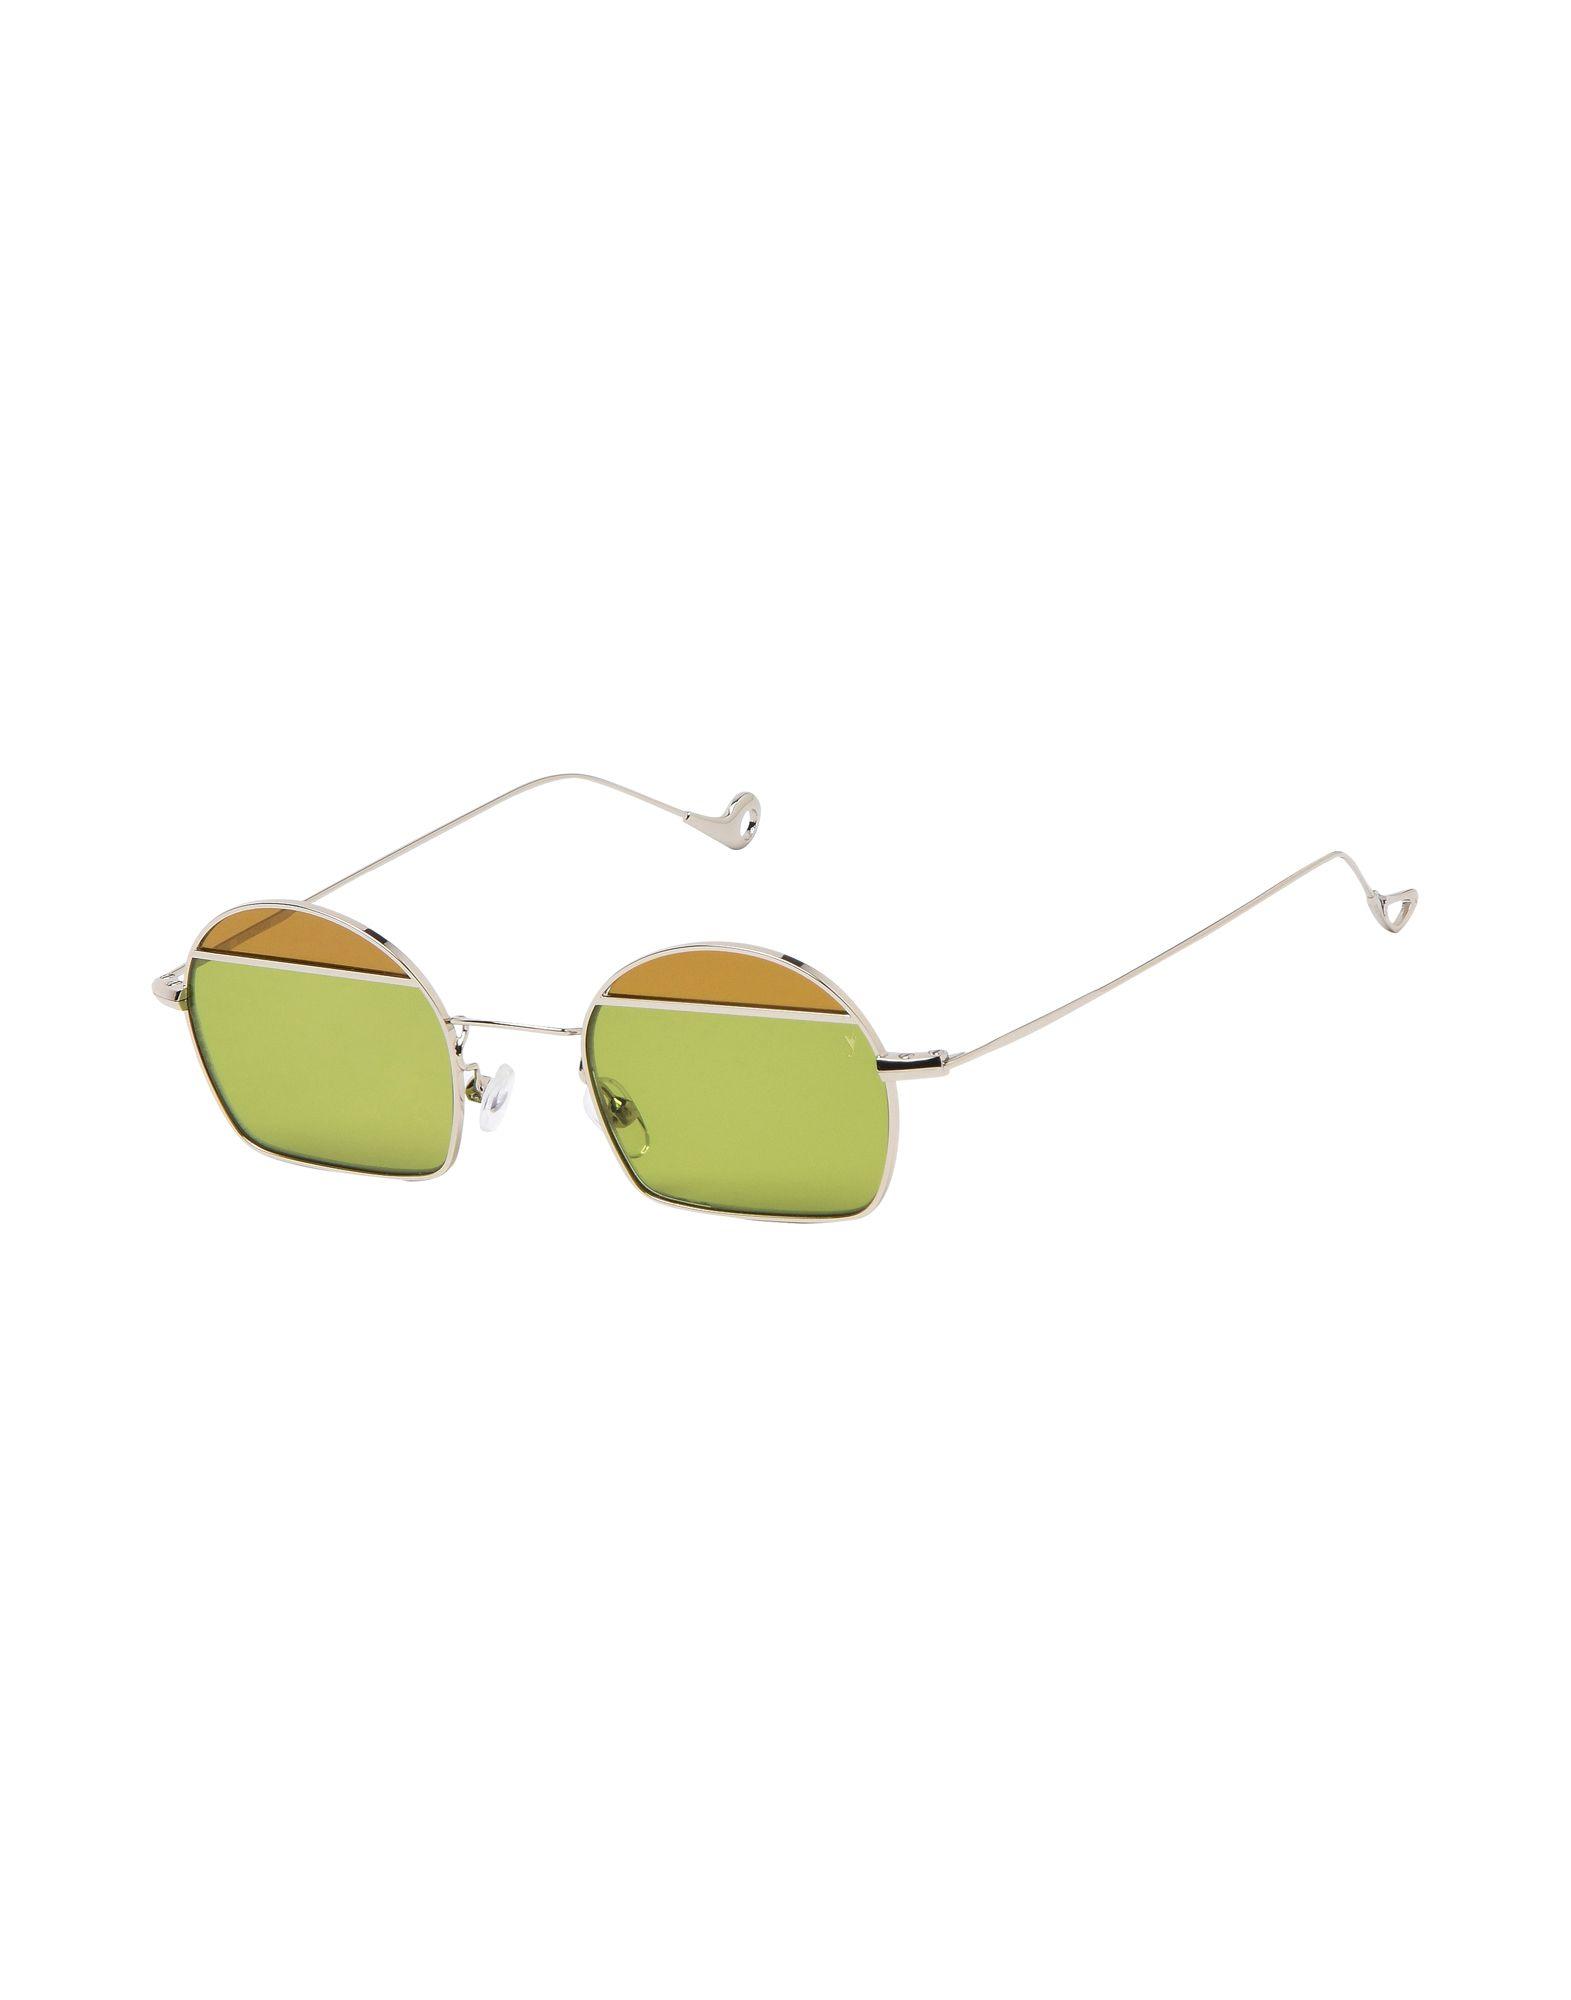 Occhiali Da Sole Eyepetizer Ralph - Uomo - Acquista online su